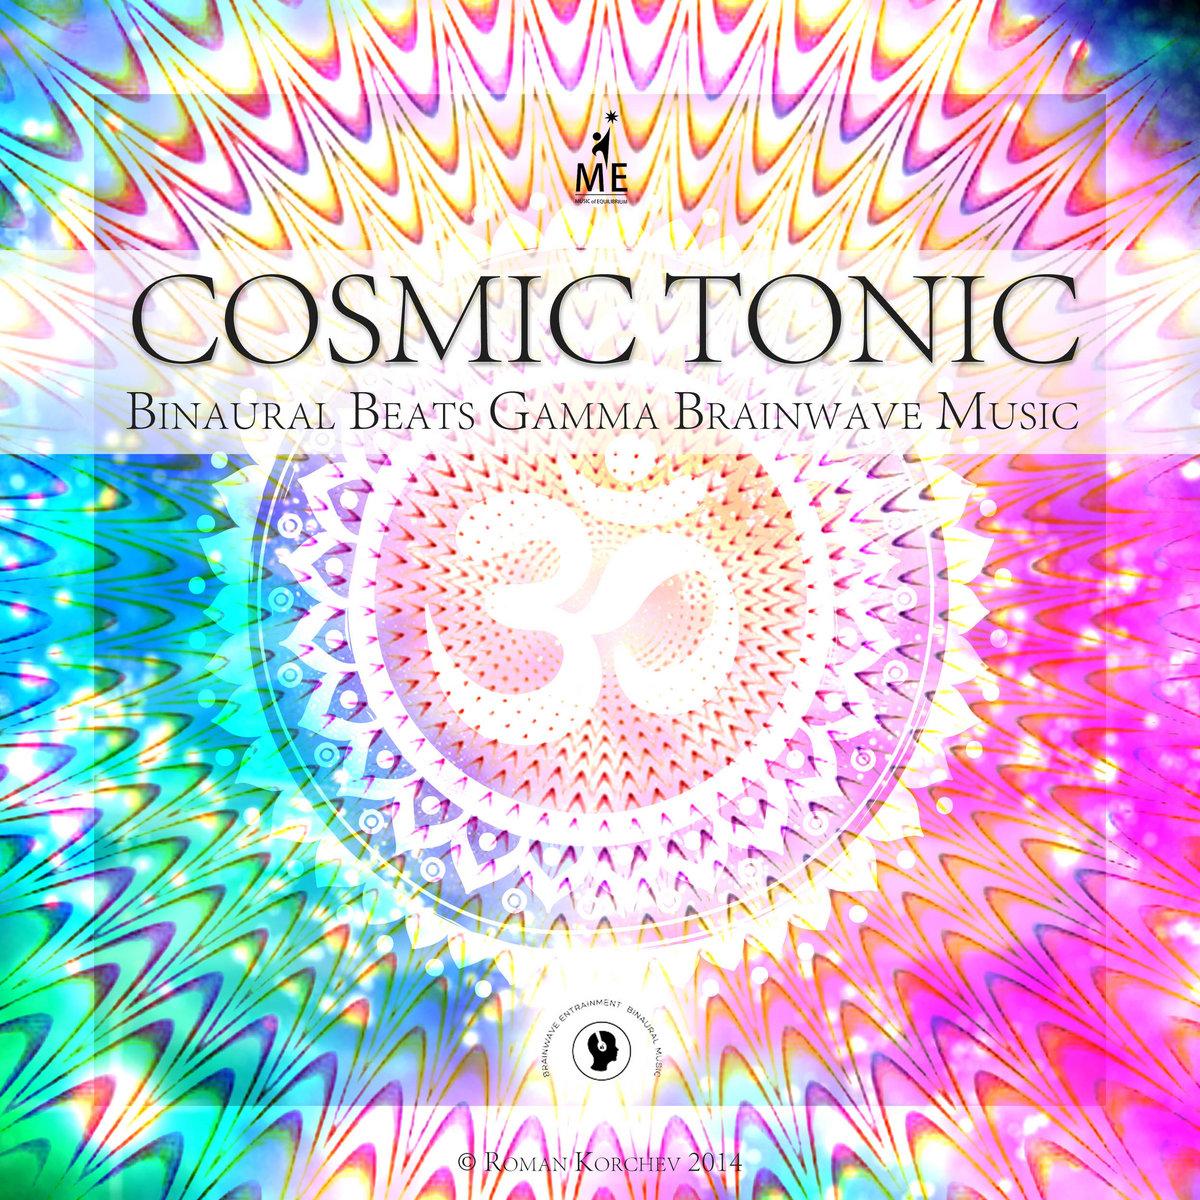 Cosmic Tonic - Binaural Beats Gamma Brainwave Music | Roman Korchev